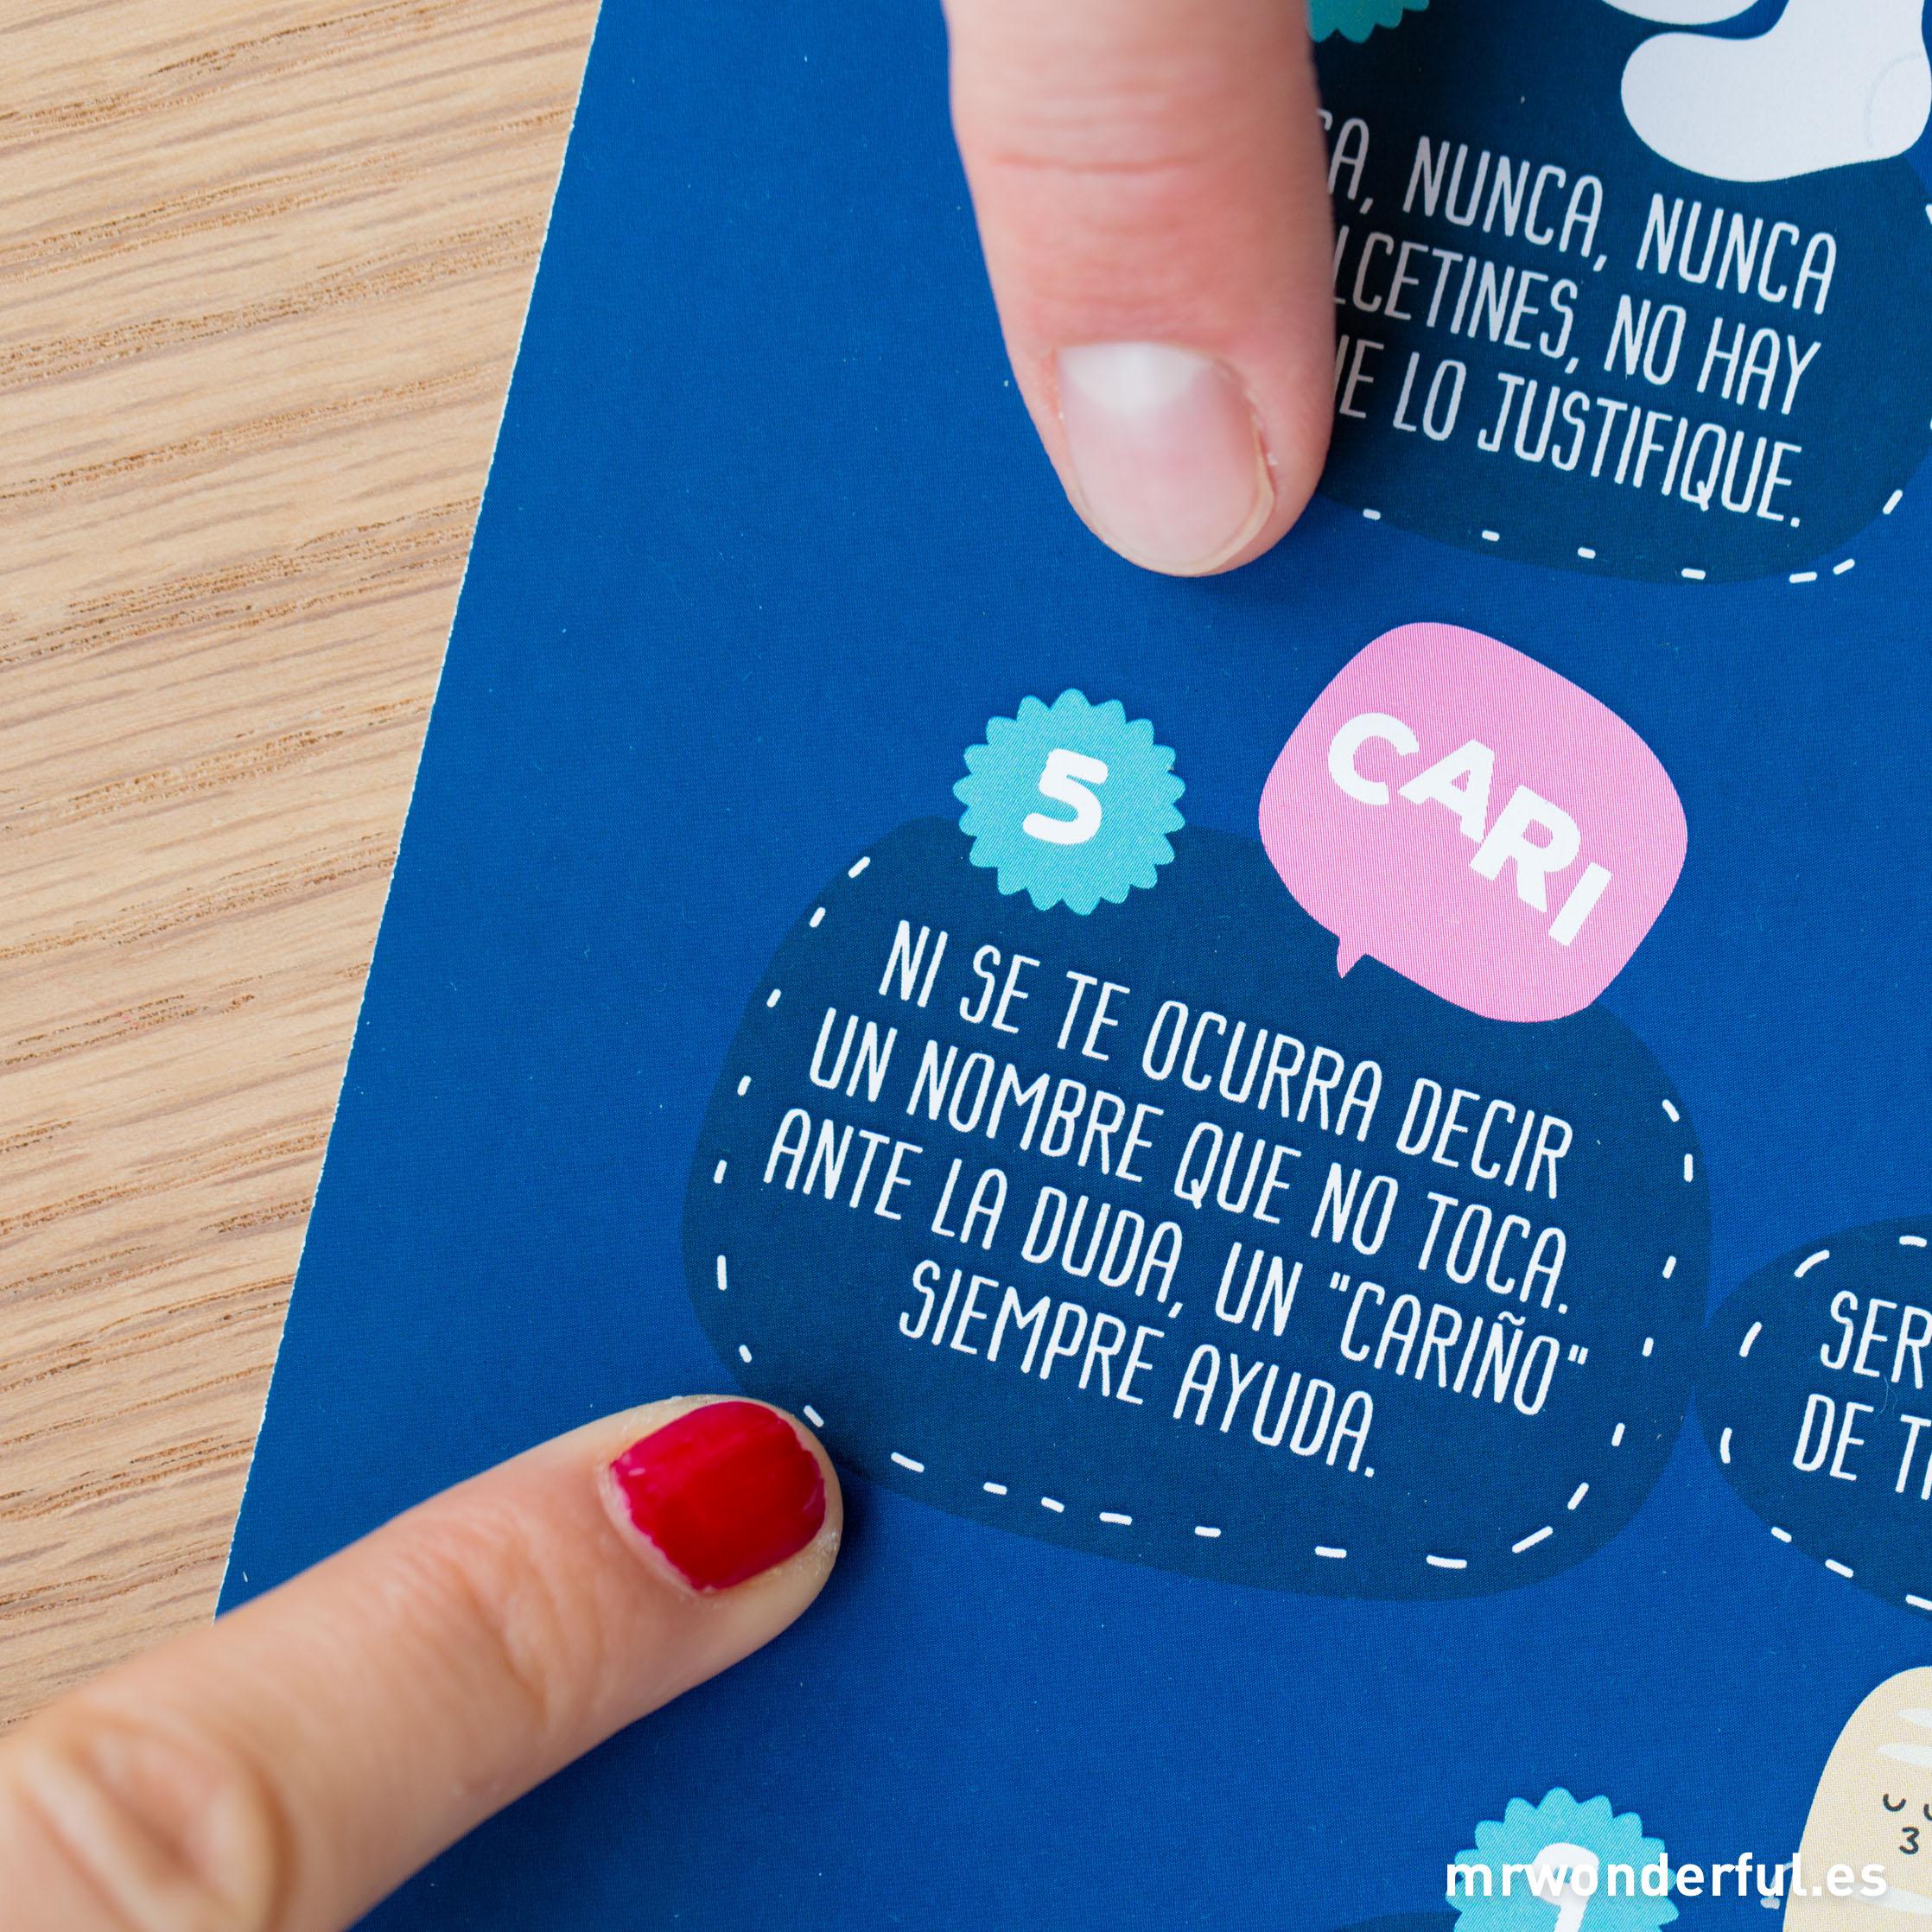 mrwonderful_control-muy-molon-preservativos-84